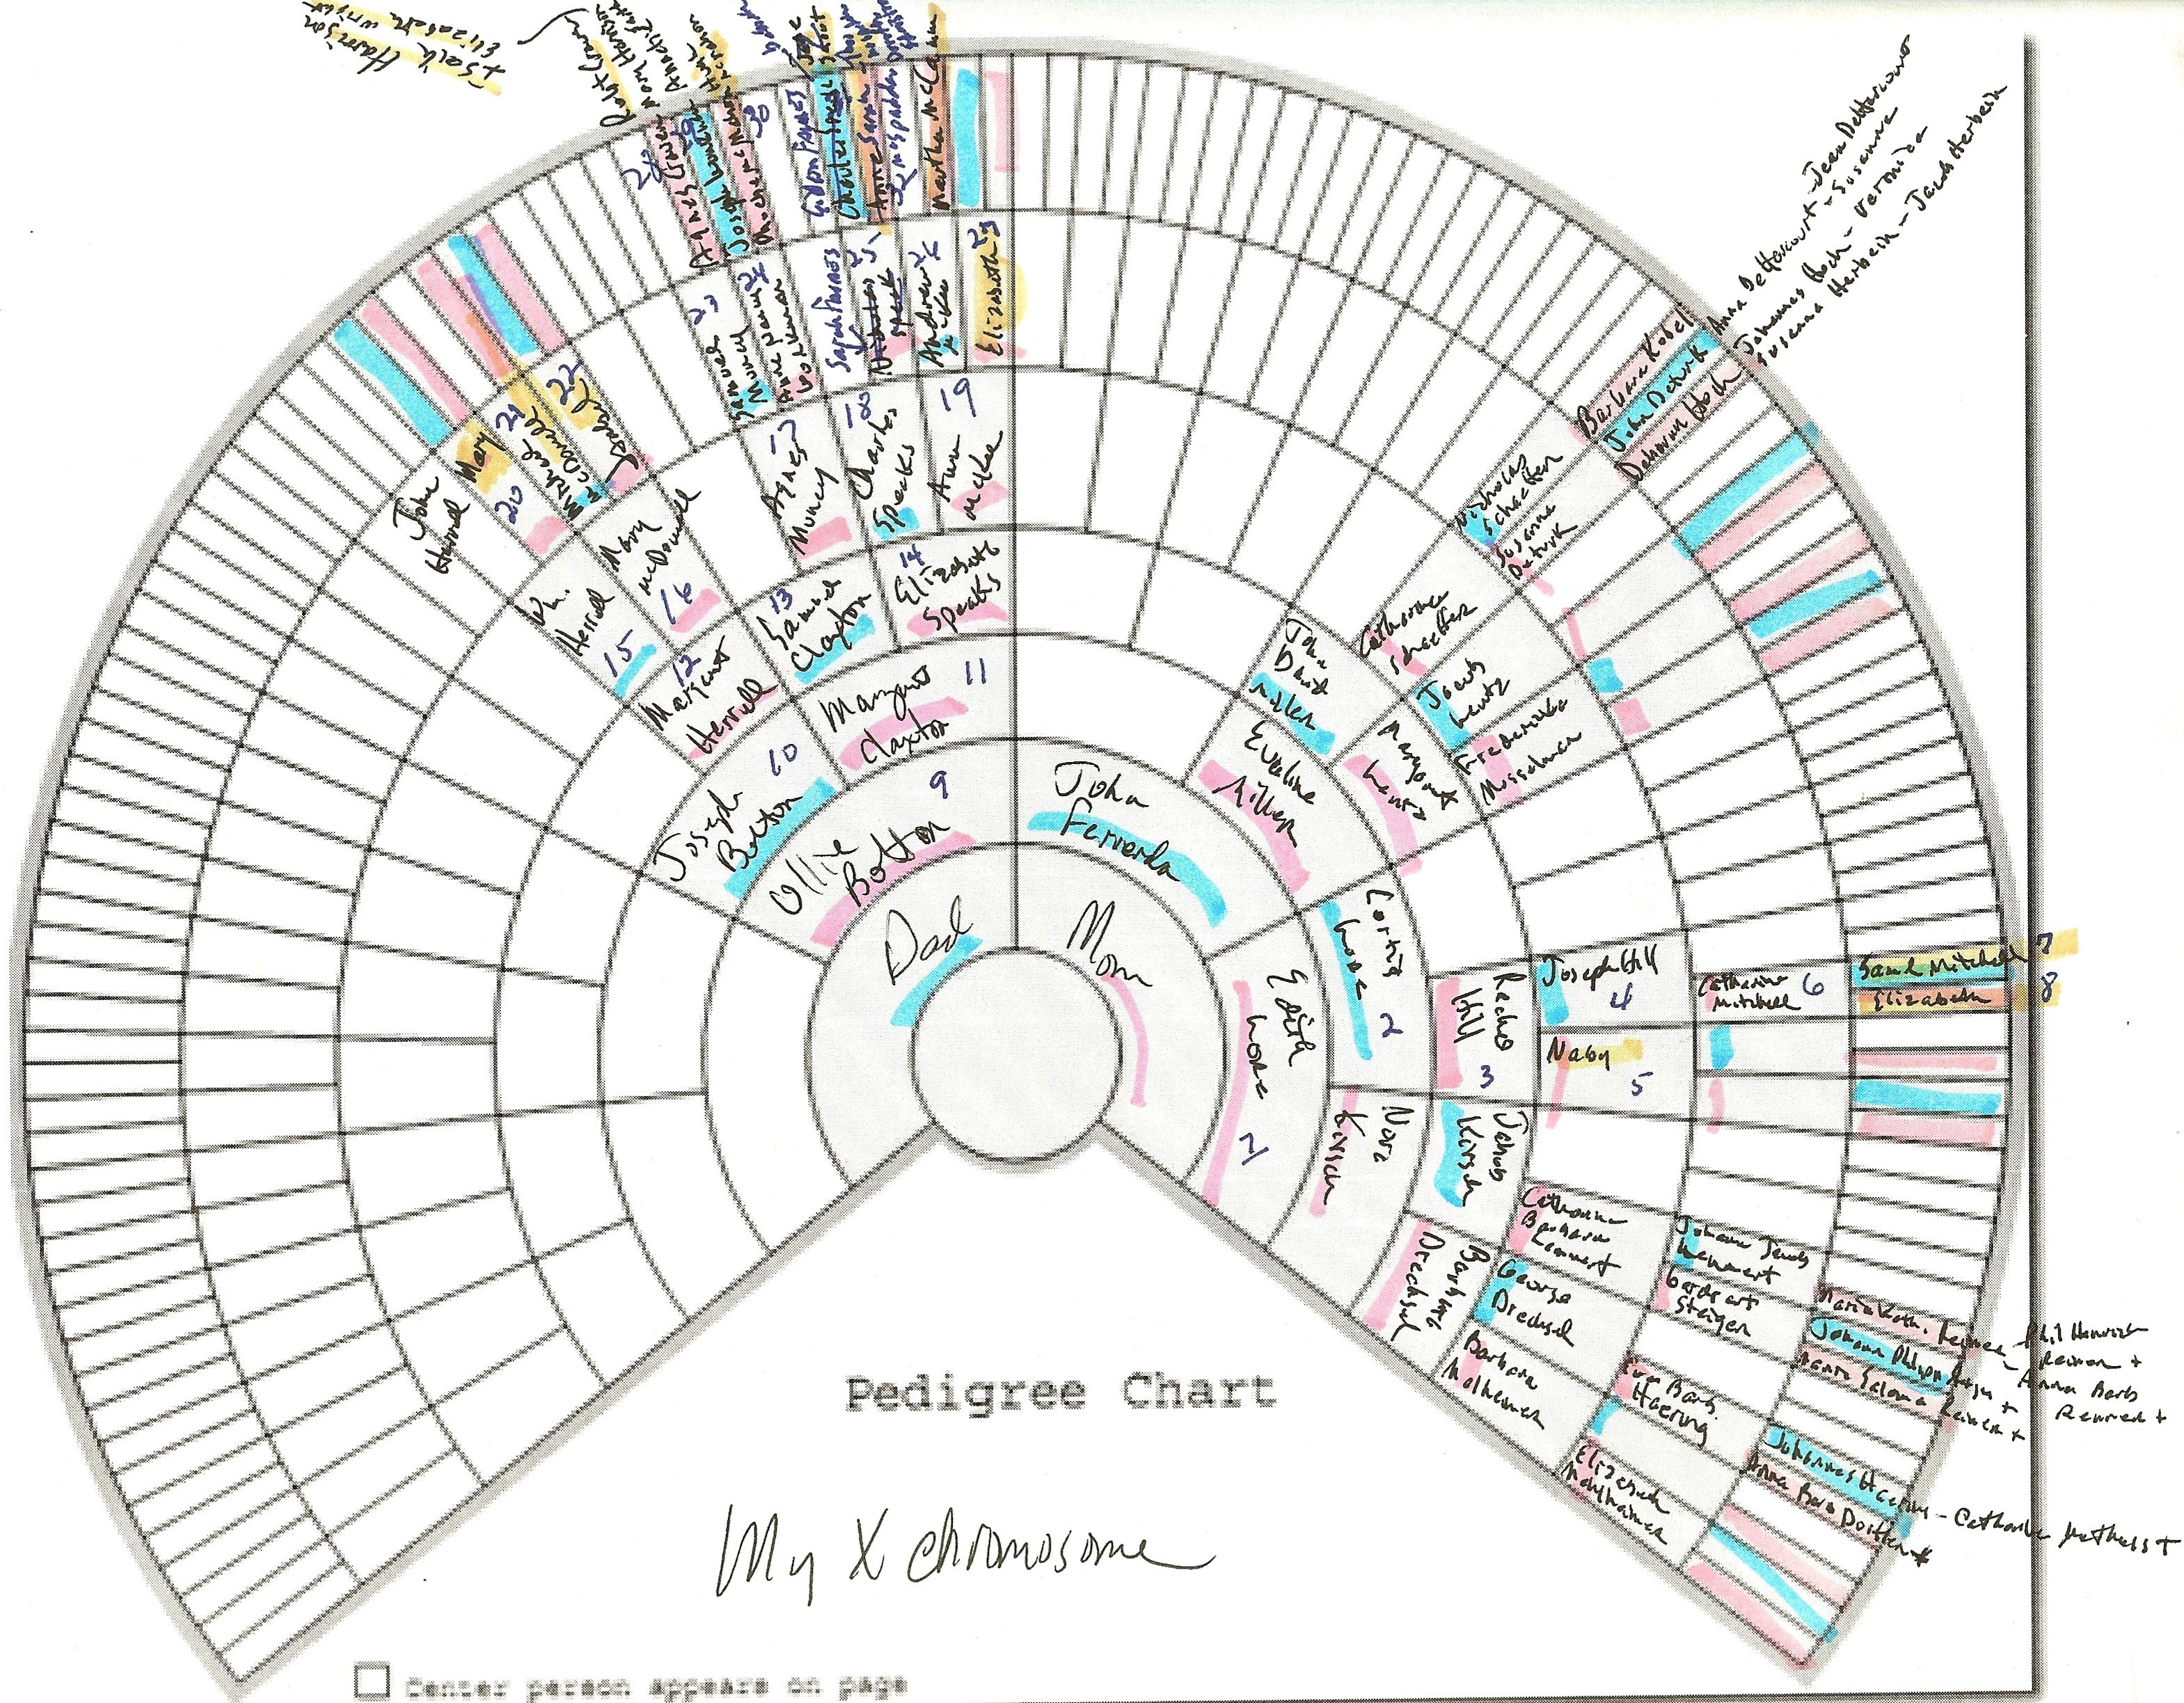 X chromosome genealogy genealogy dna testing pinterest female x chart inheritance named to make identification easier altavistaventures Images